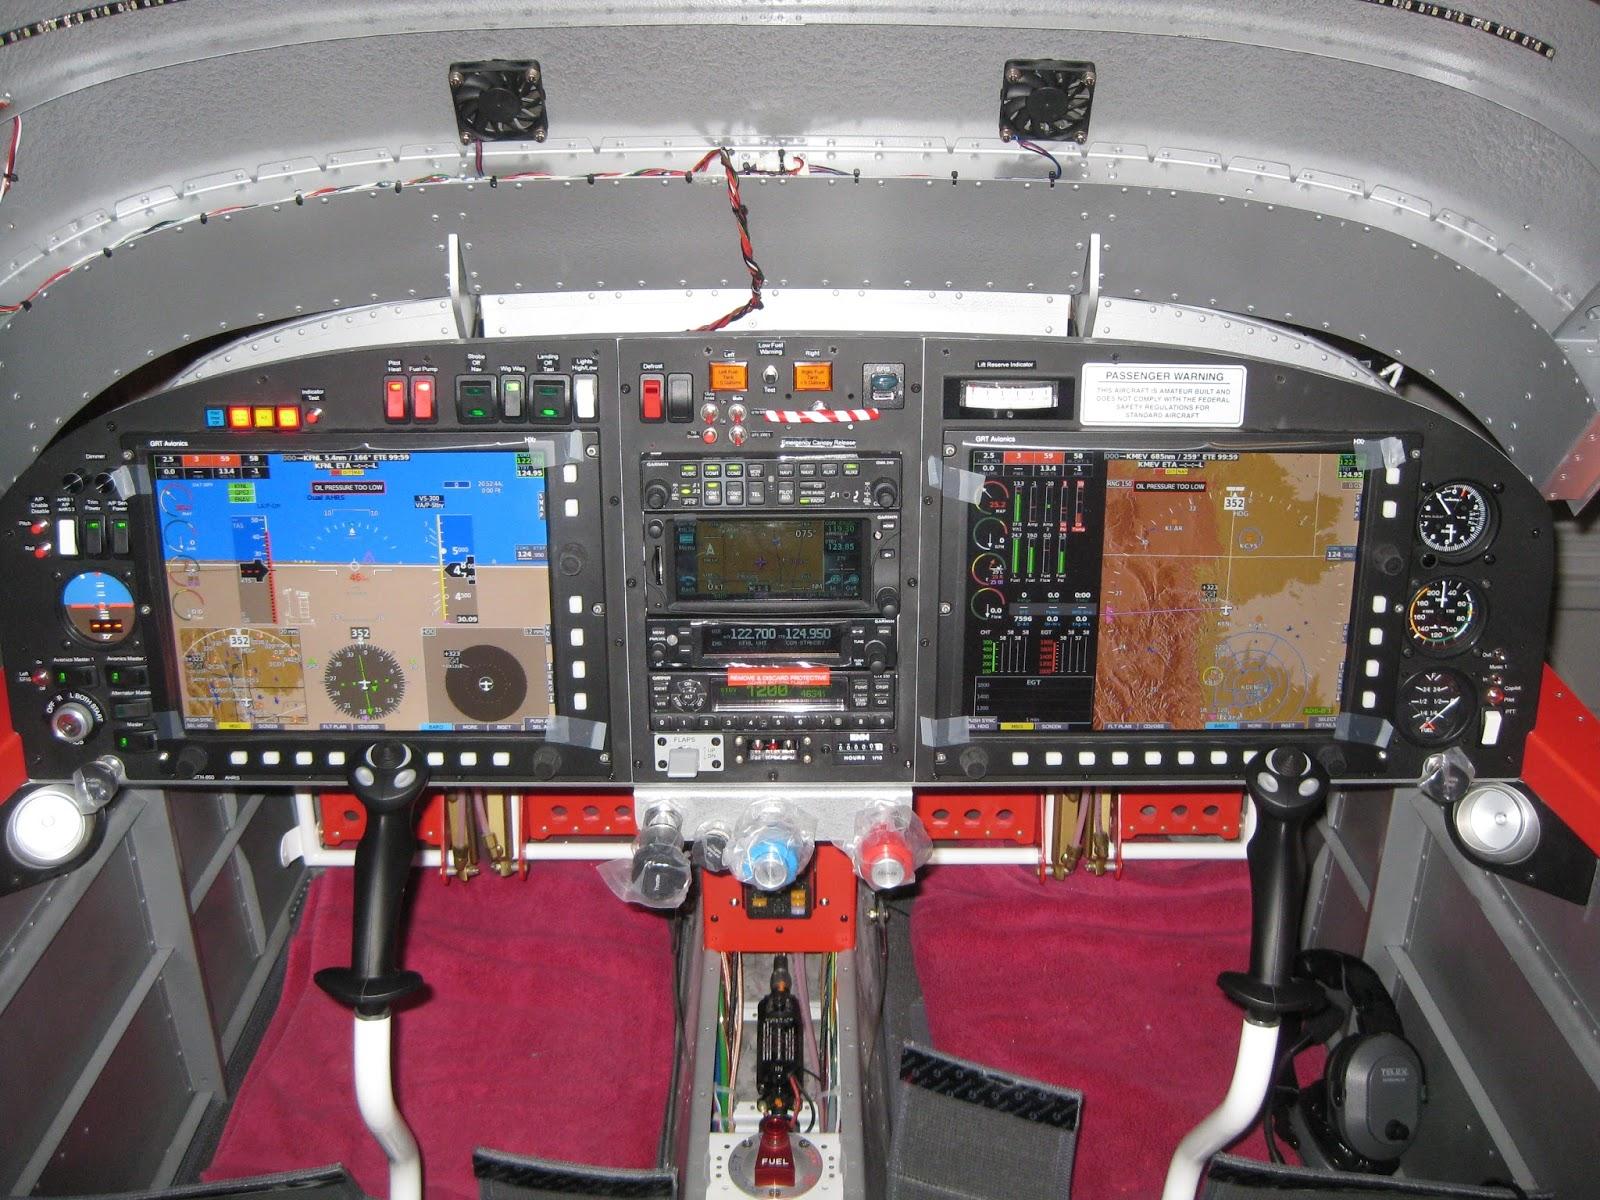 E's Van's RV-14A: Avionics/Panel: Panel design